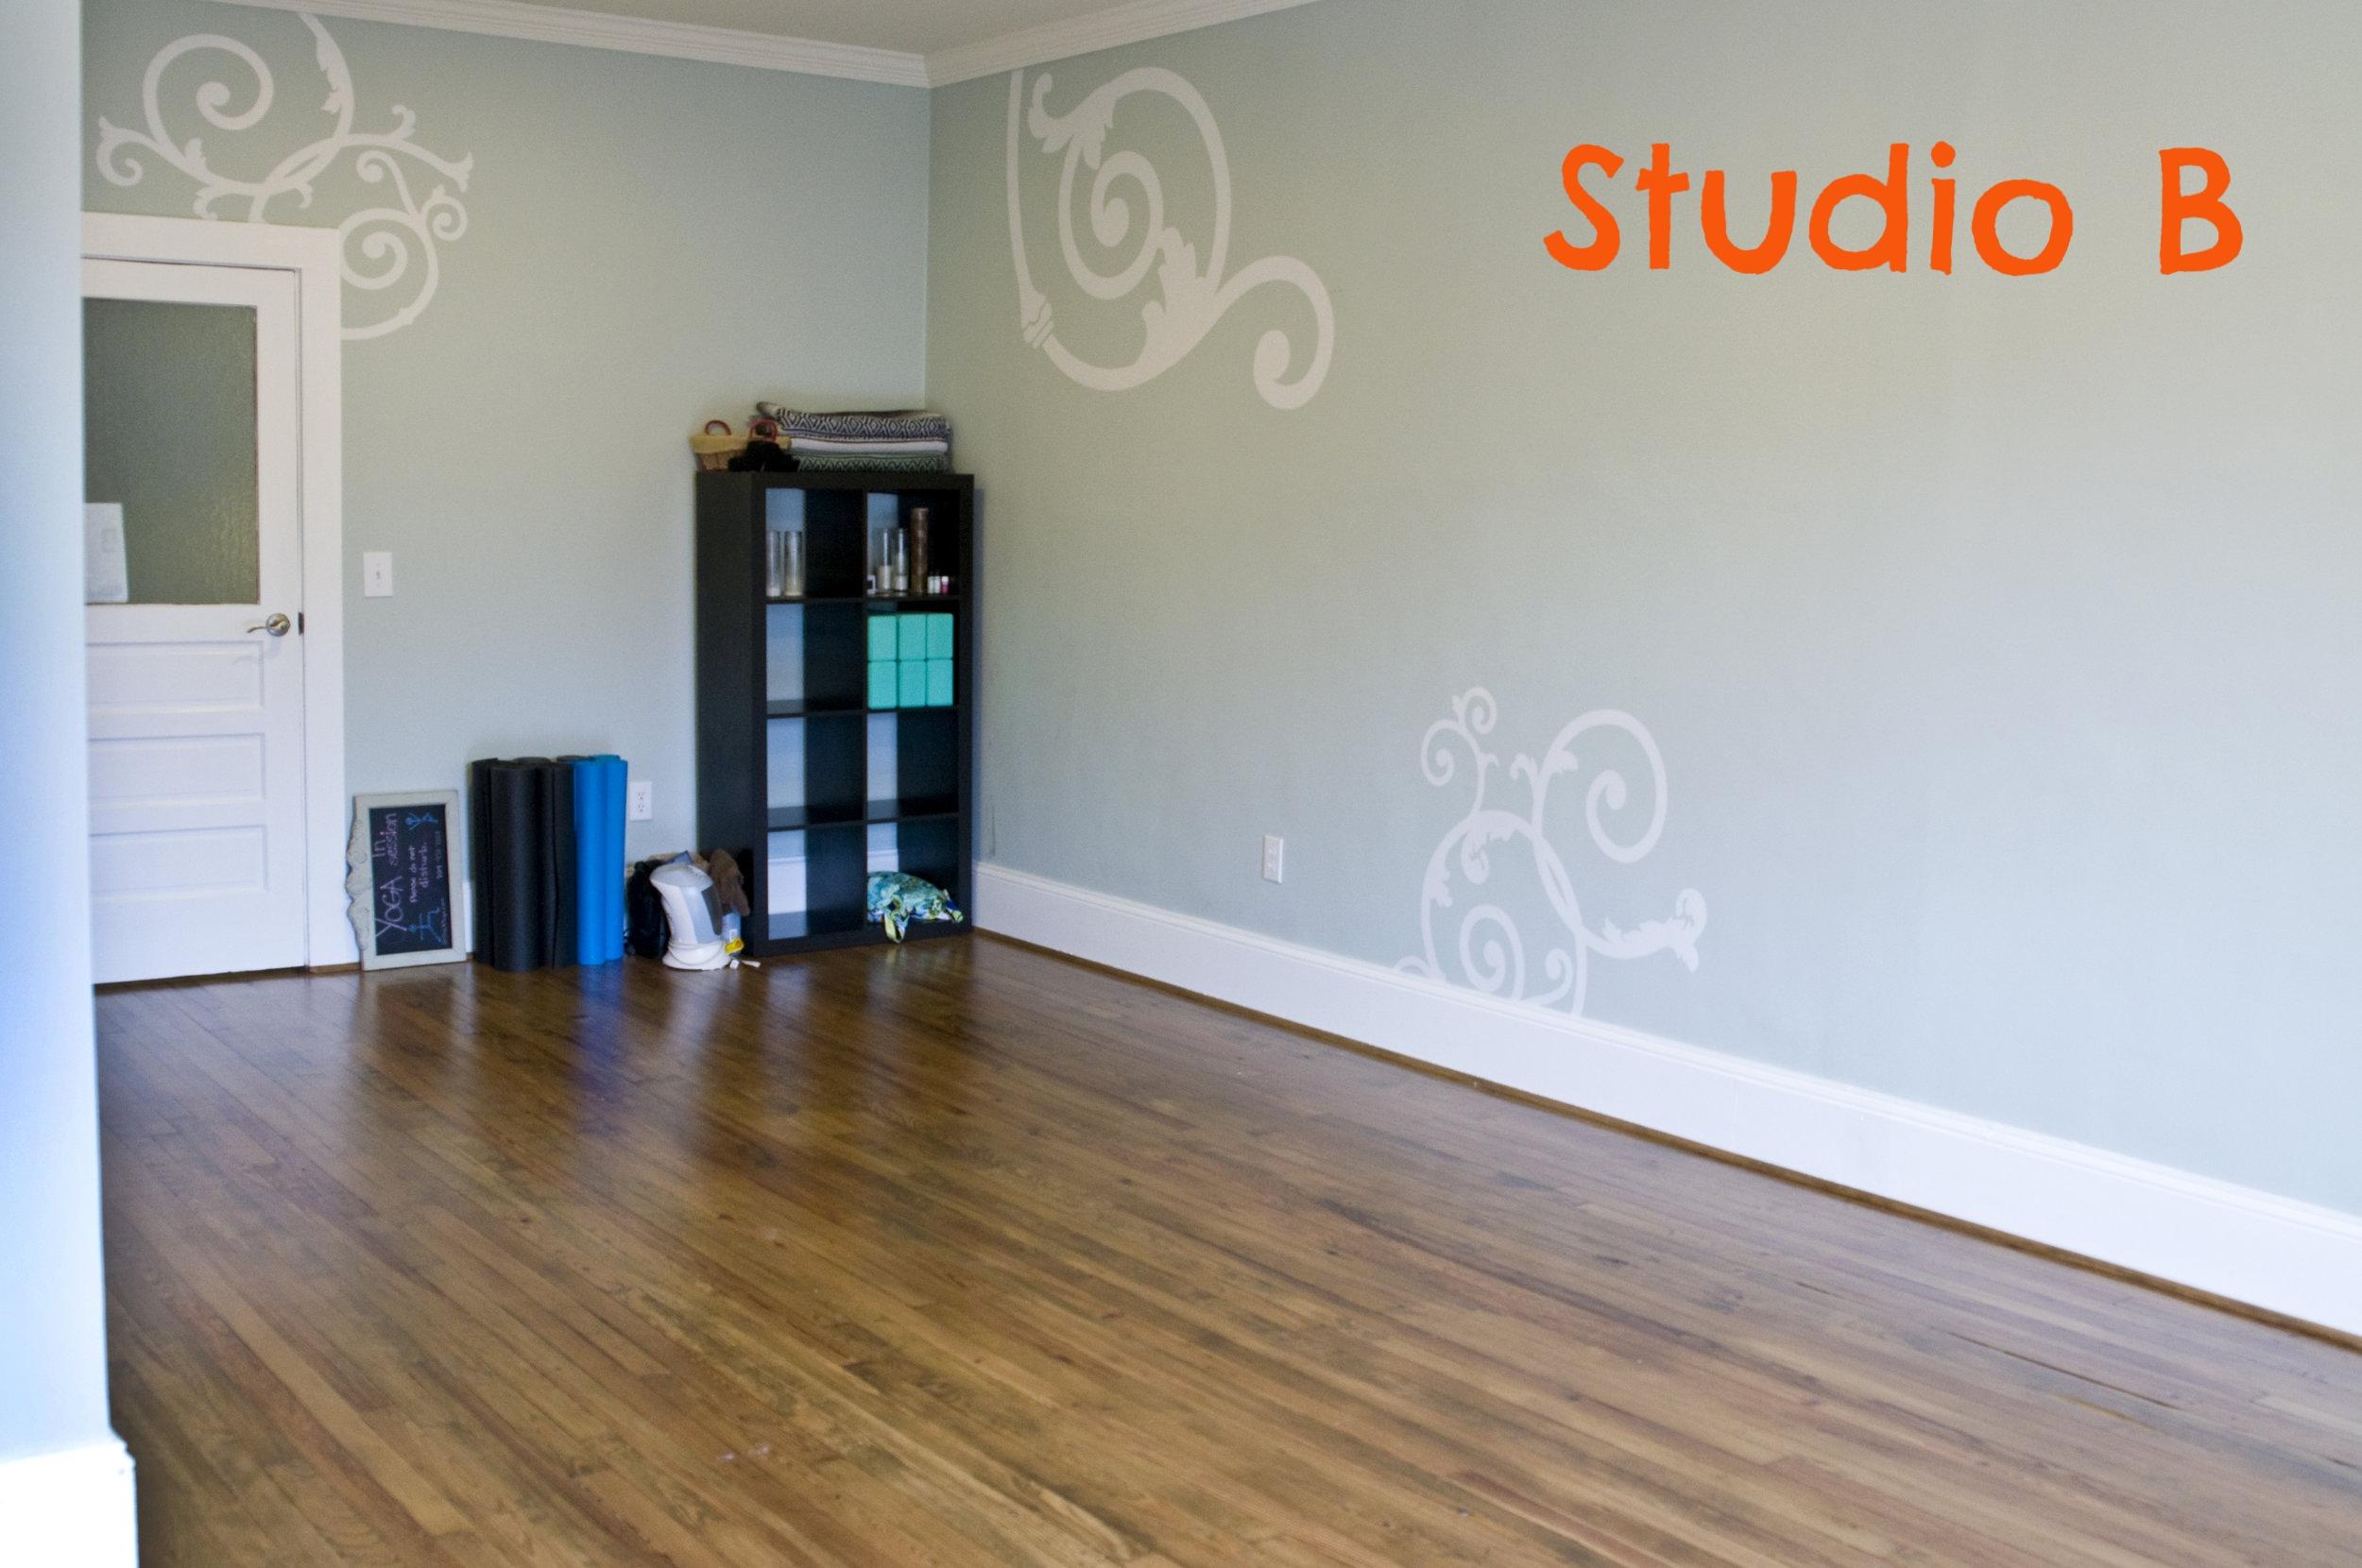 StudioB 2.jpg